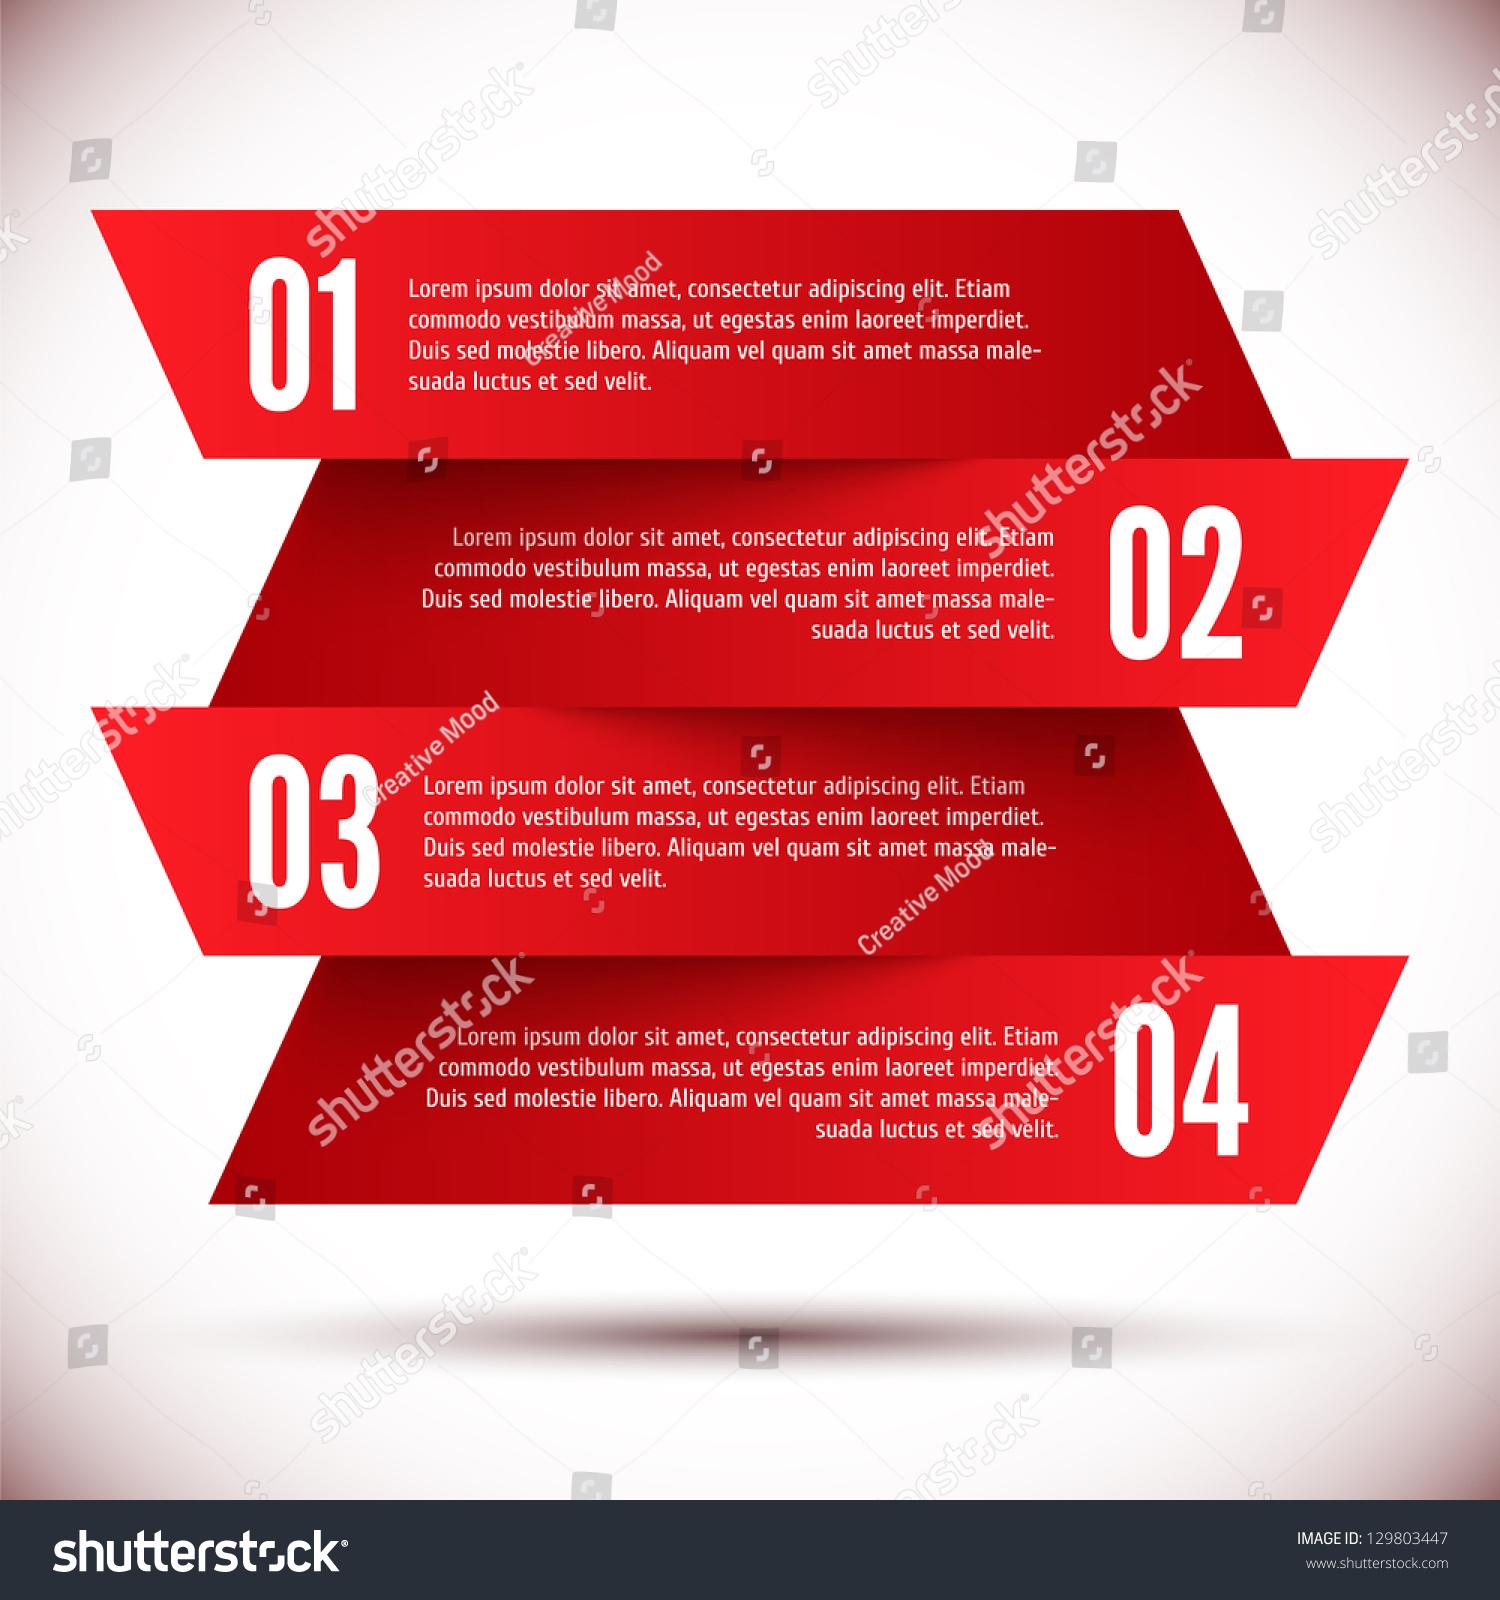 Banner Design Template Stock Vector 129803447 - Shutterstock